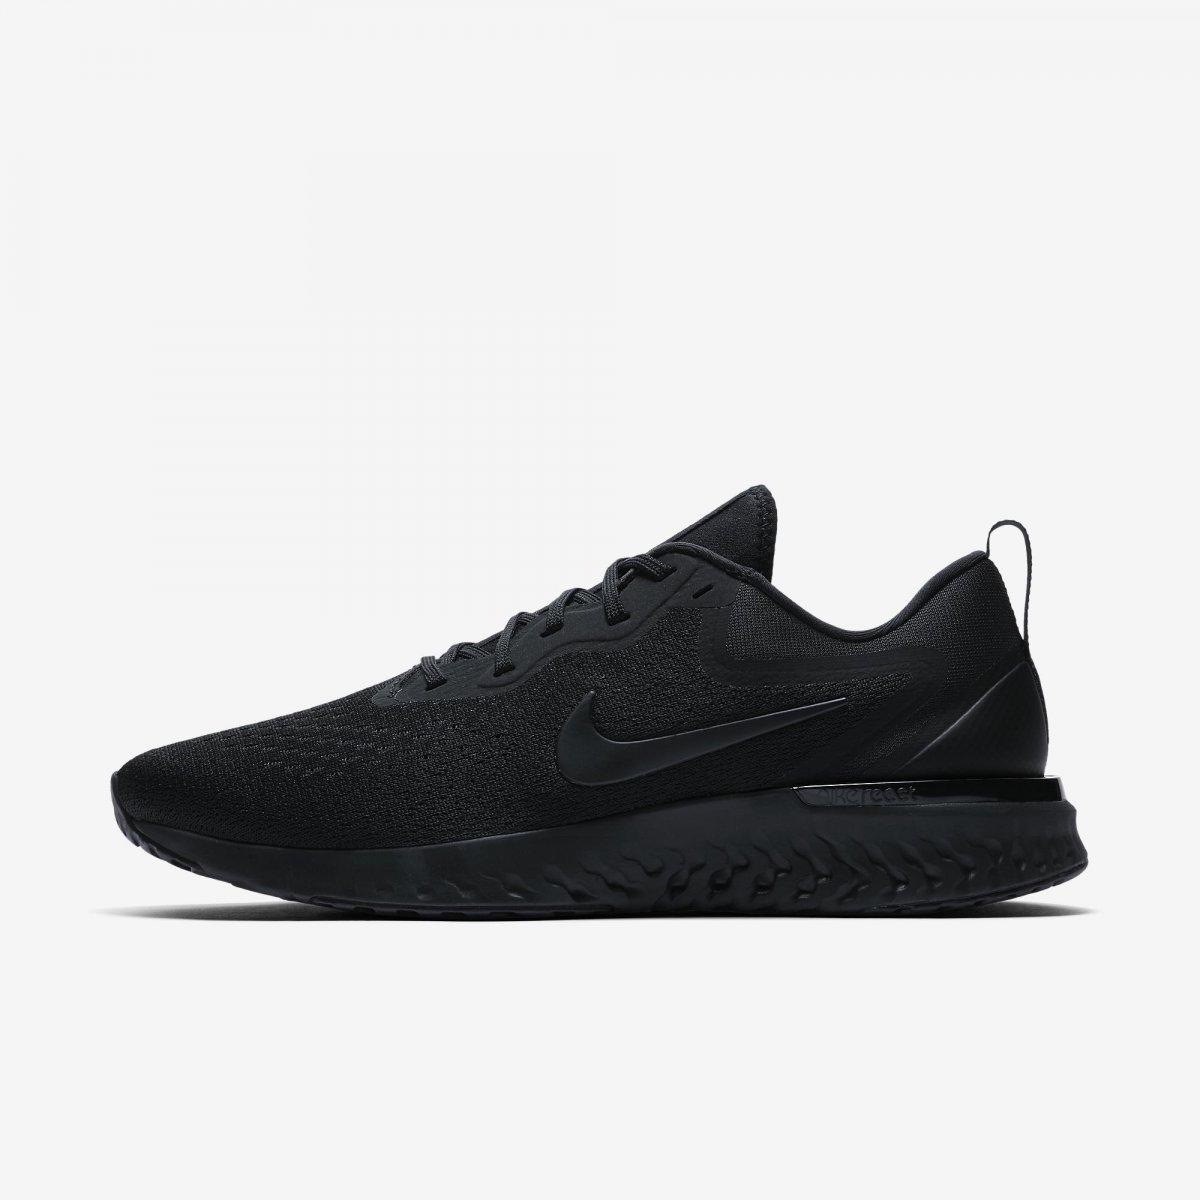 a223fd0f4aa Tênis Nike Odyssey React Masculino 887231043REACT Nike - PT ...